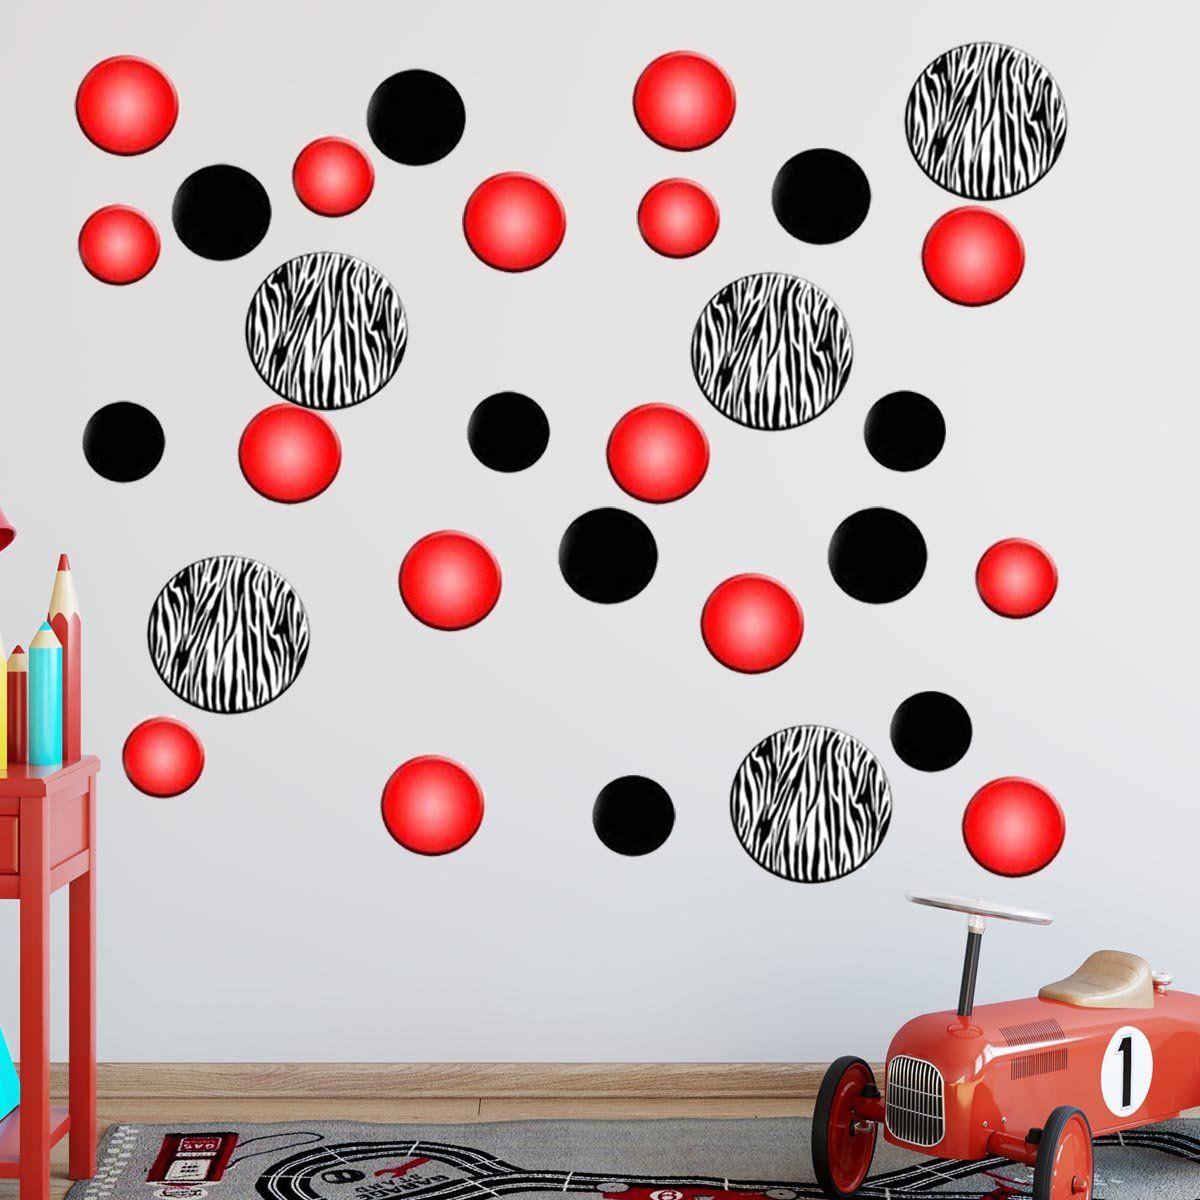 Vwaq Zebra Stripe Polka Dots And Peel And Stick Red Circles Wall